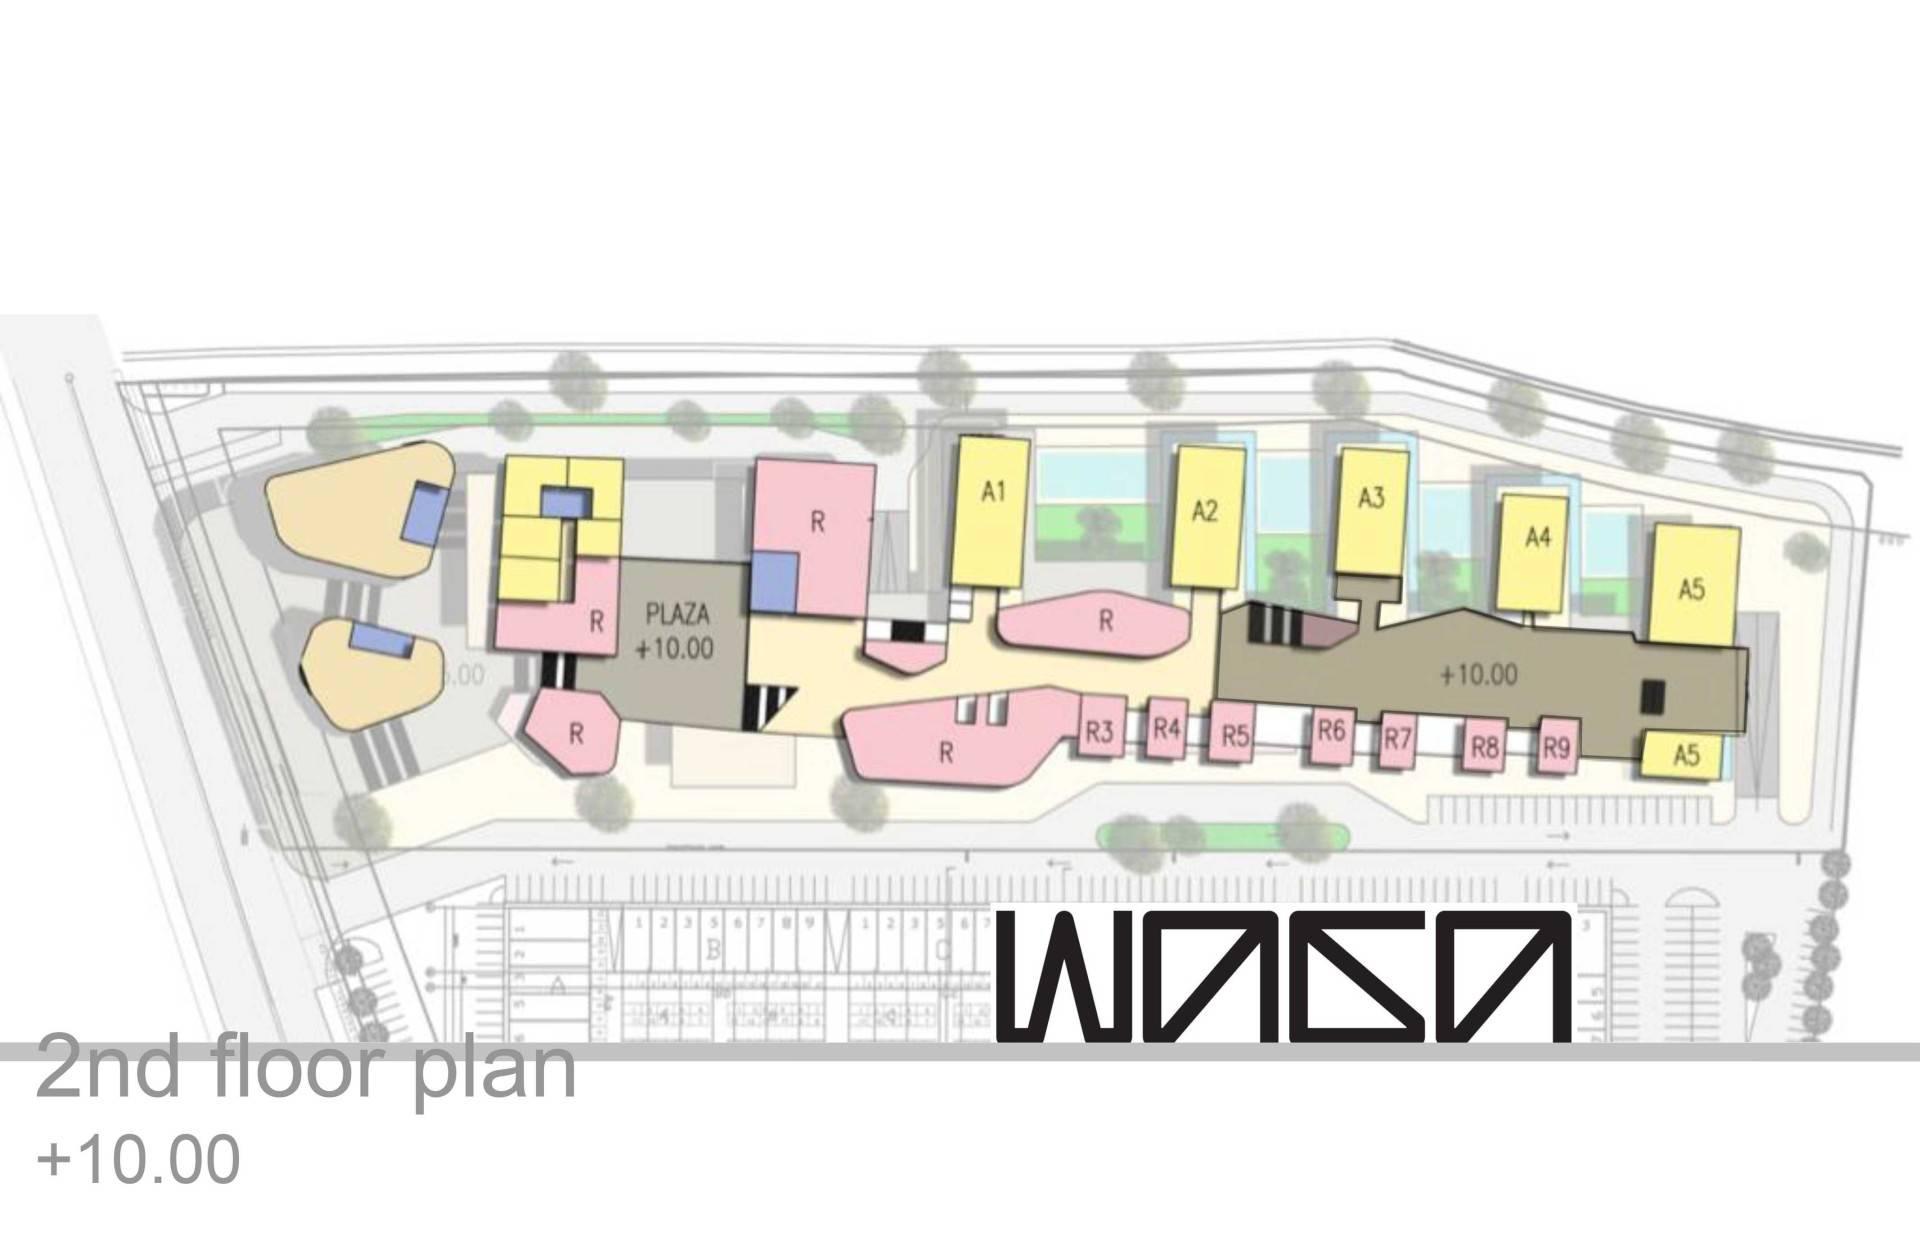 Waga Daan Mogot High Park Masterplan Jakarta, Indonesia Jakarta, Indonesia 2Nd-Floor-Plan Kontemporer  7322